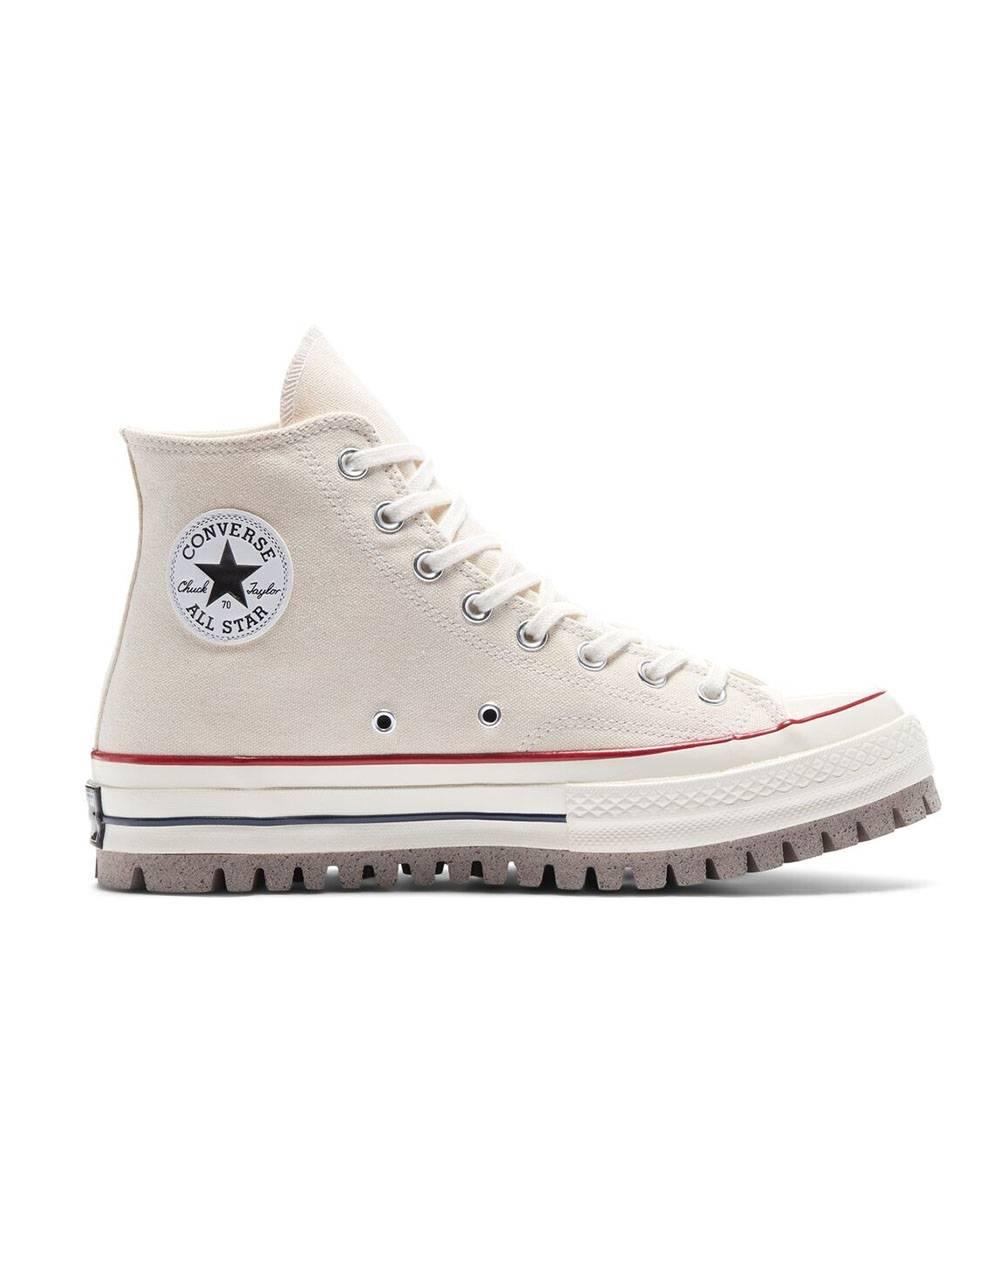 Converse Woman Trek Chuck 70 High Top - parchment vintage white Converse Sneakers 145,00€